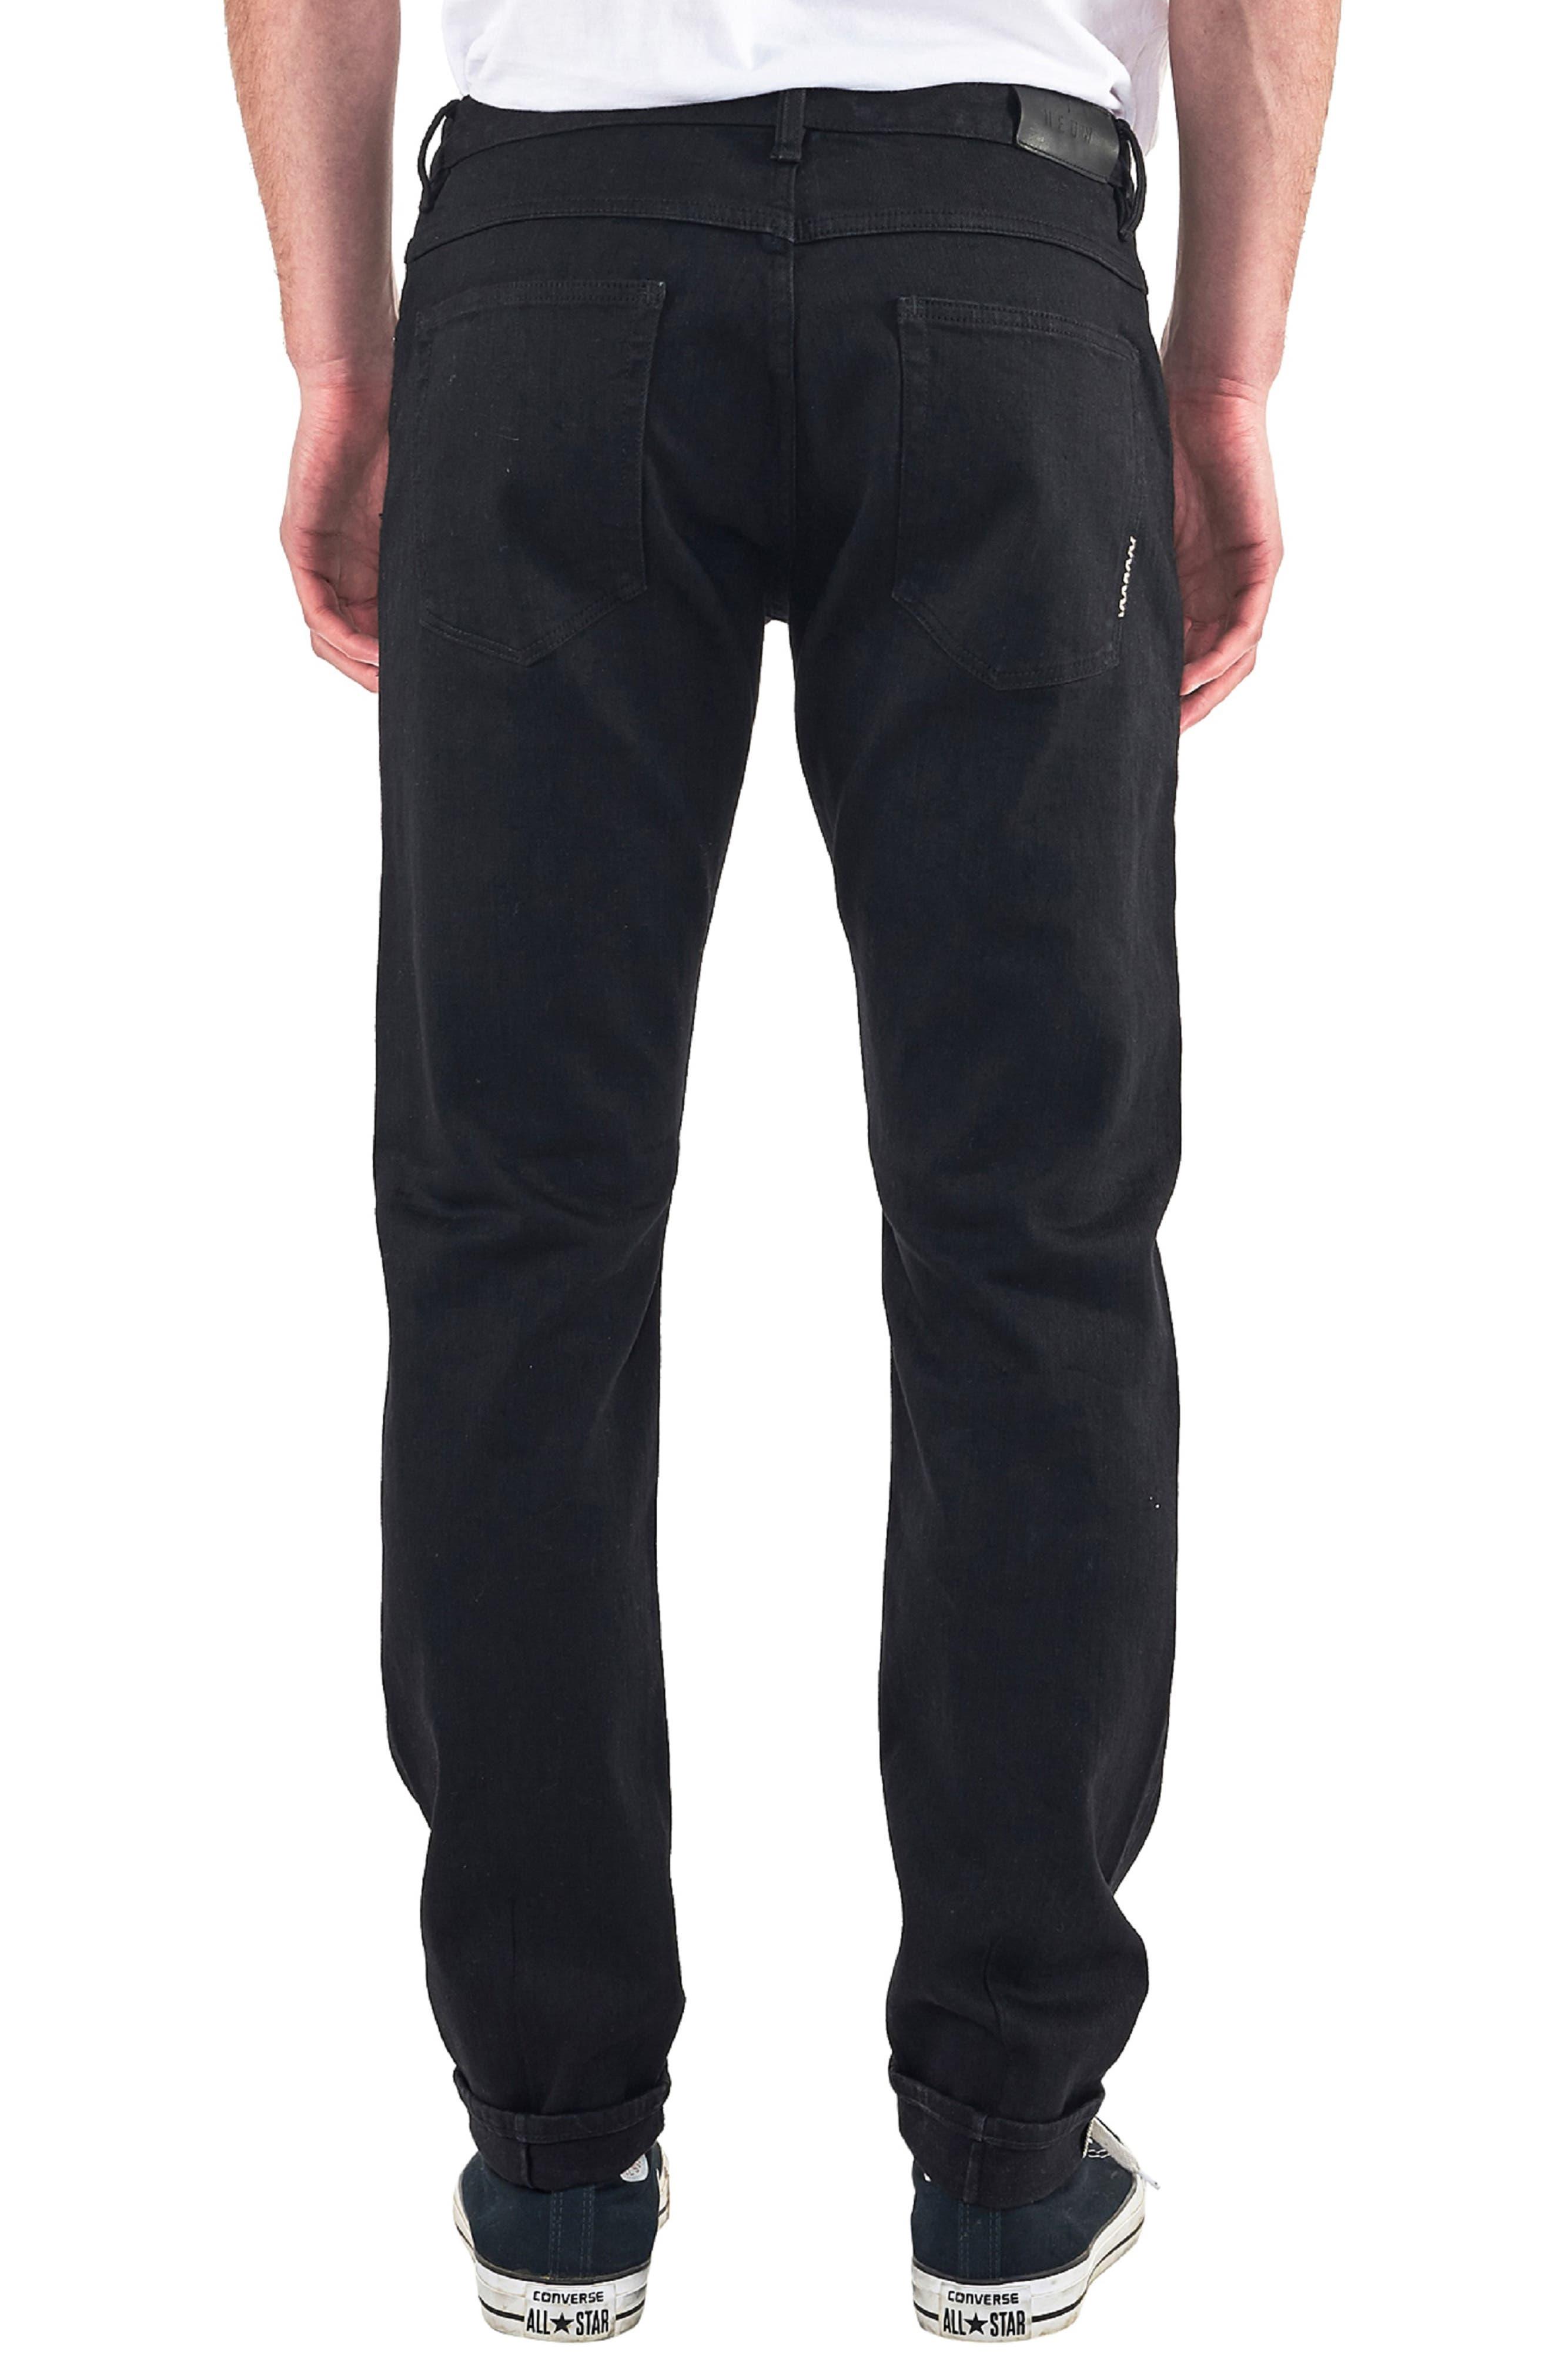 Lou Slim Fit Jeans,                             Alternate thumbnail 2, color,                             BLACK SELVEDGE